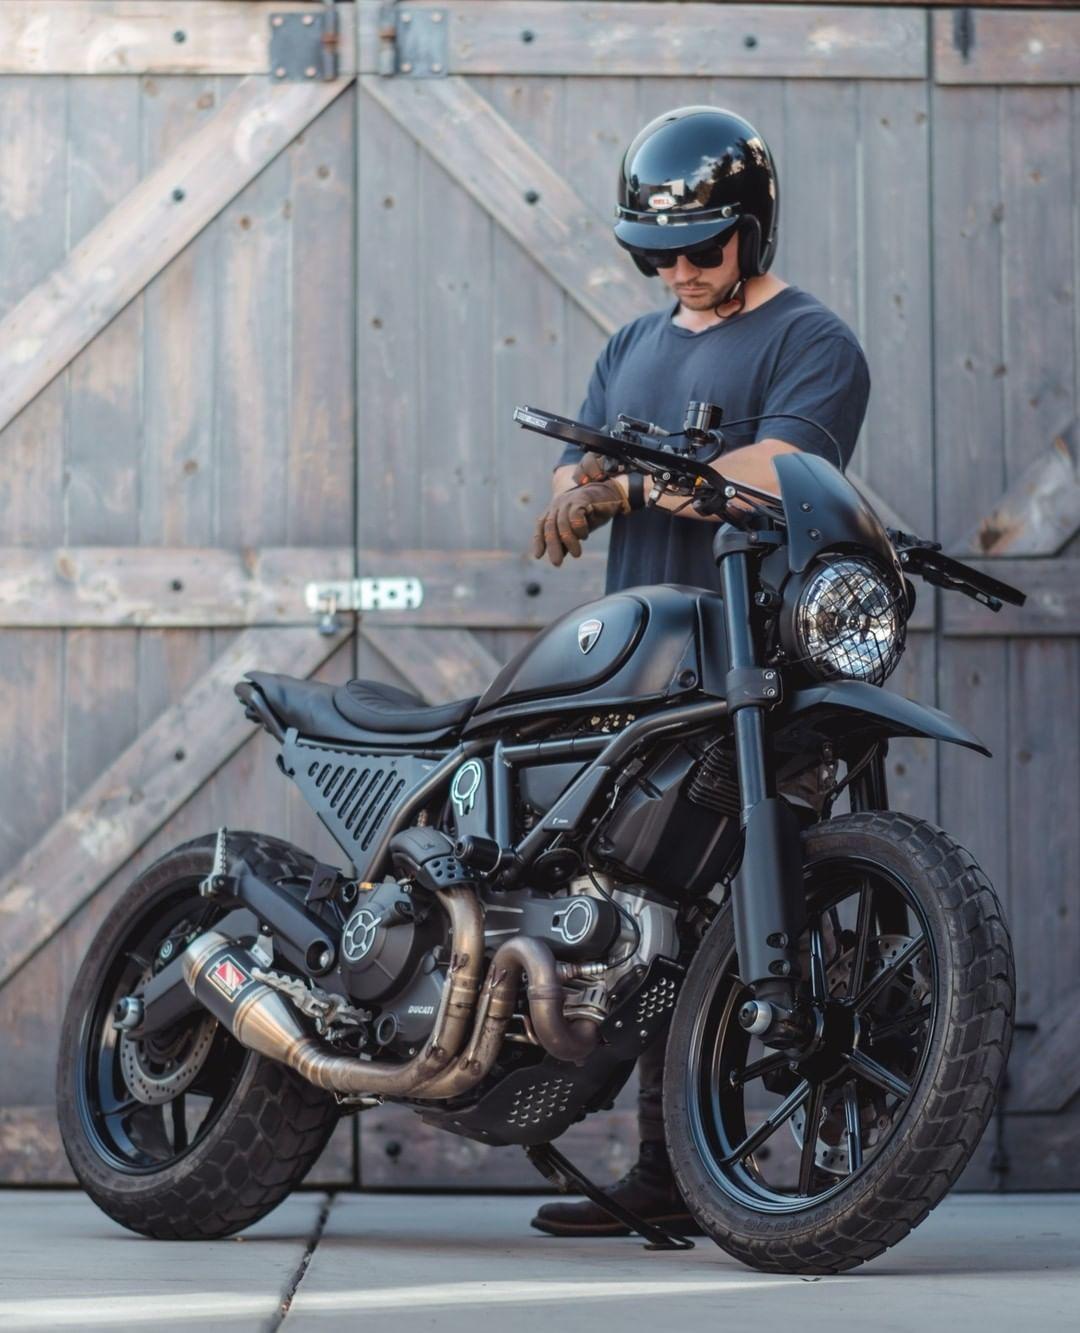 Gorm Taube On Instagram Time Check Gorm Moto Cali Californialove Motorb Scrambler Motorcycle Futuristic Motorcycle Ducati Scrambler Custom